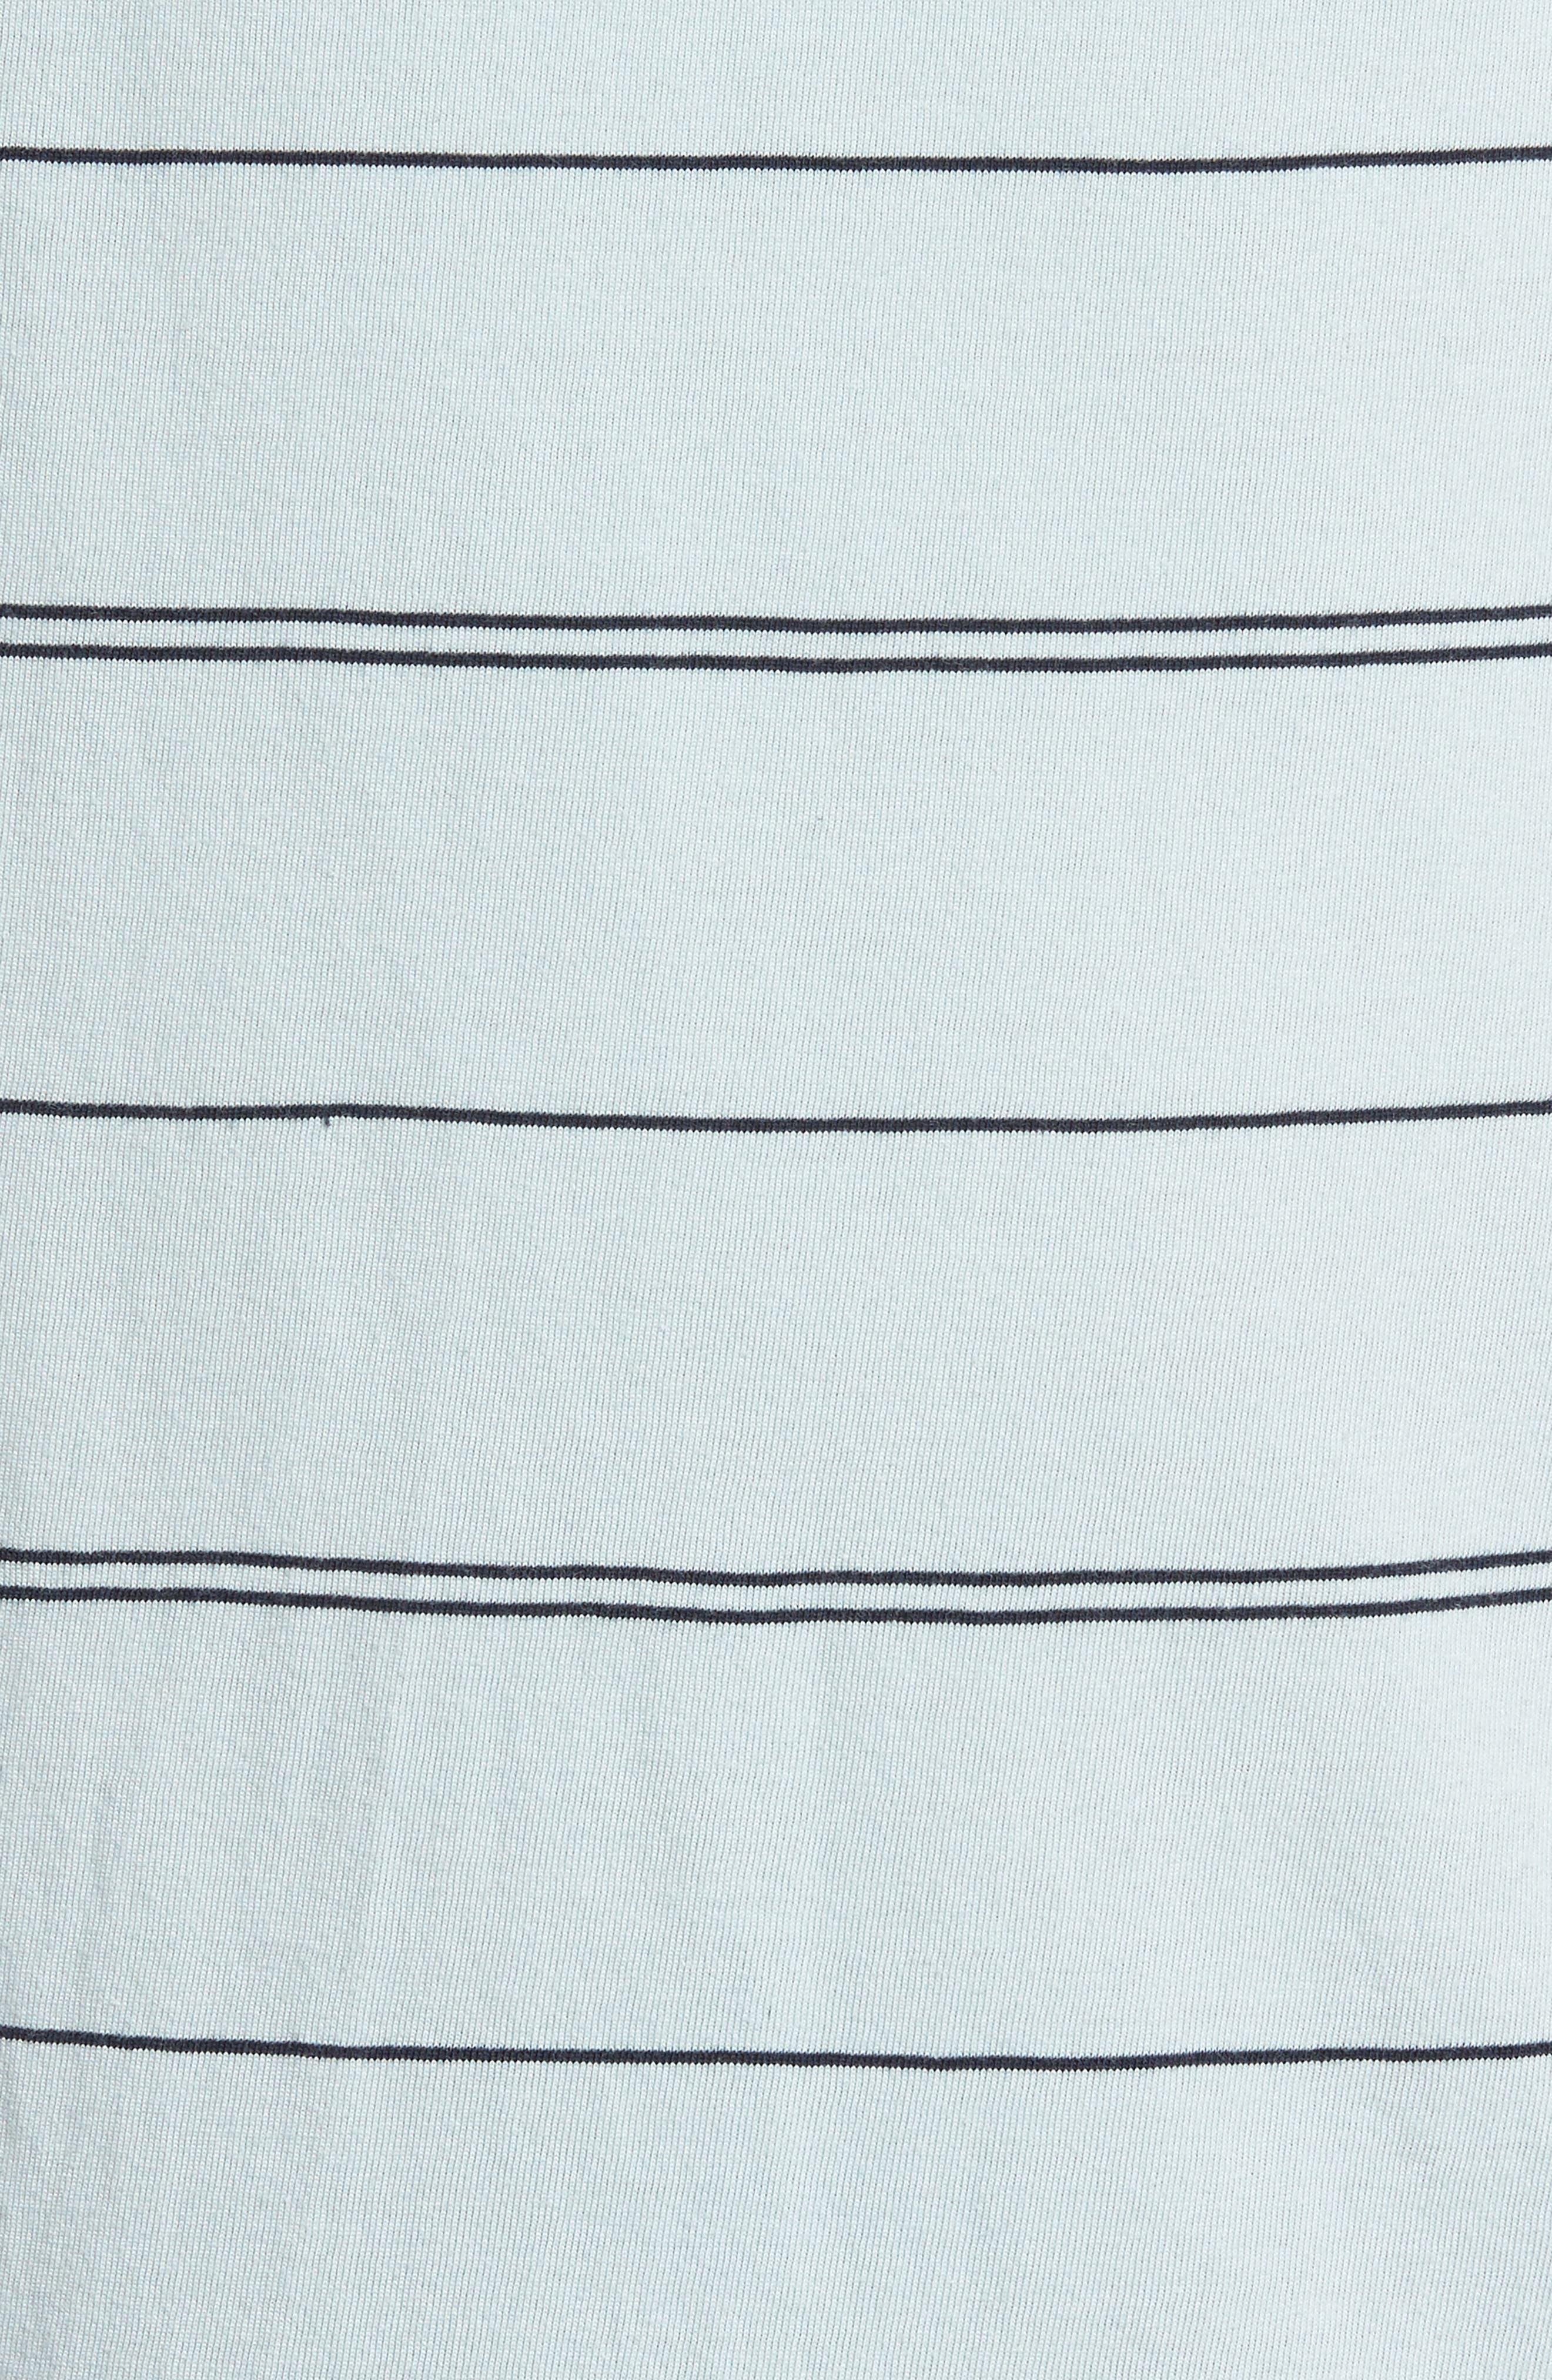 Alternate Image 5  - Billabong Die Cut Stripe Tank